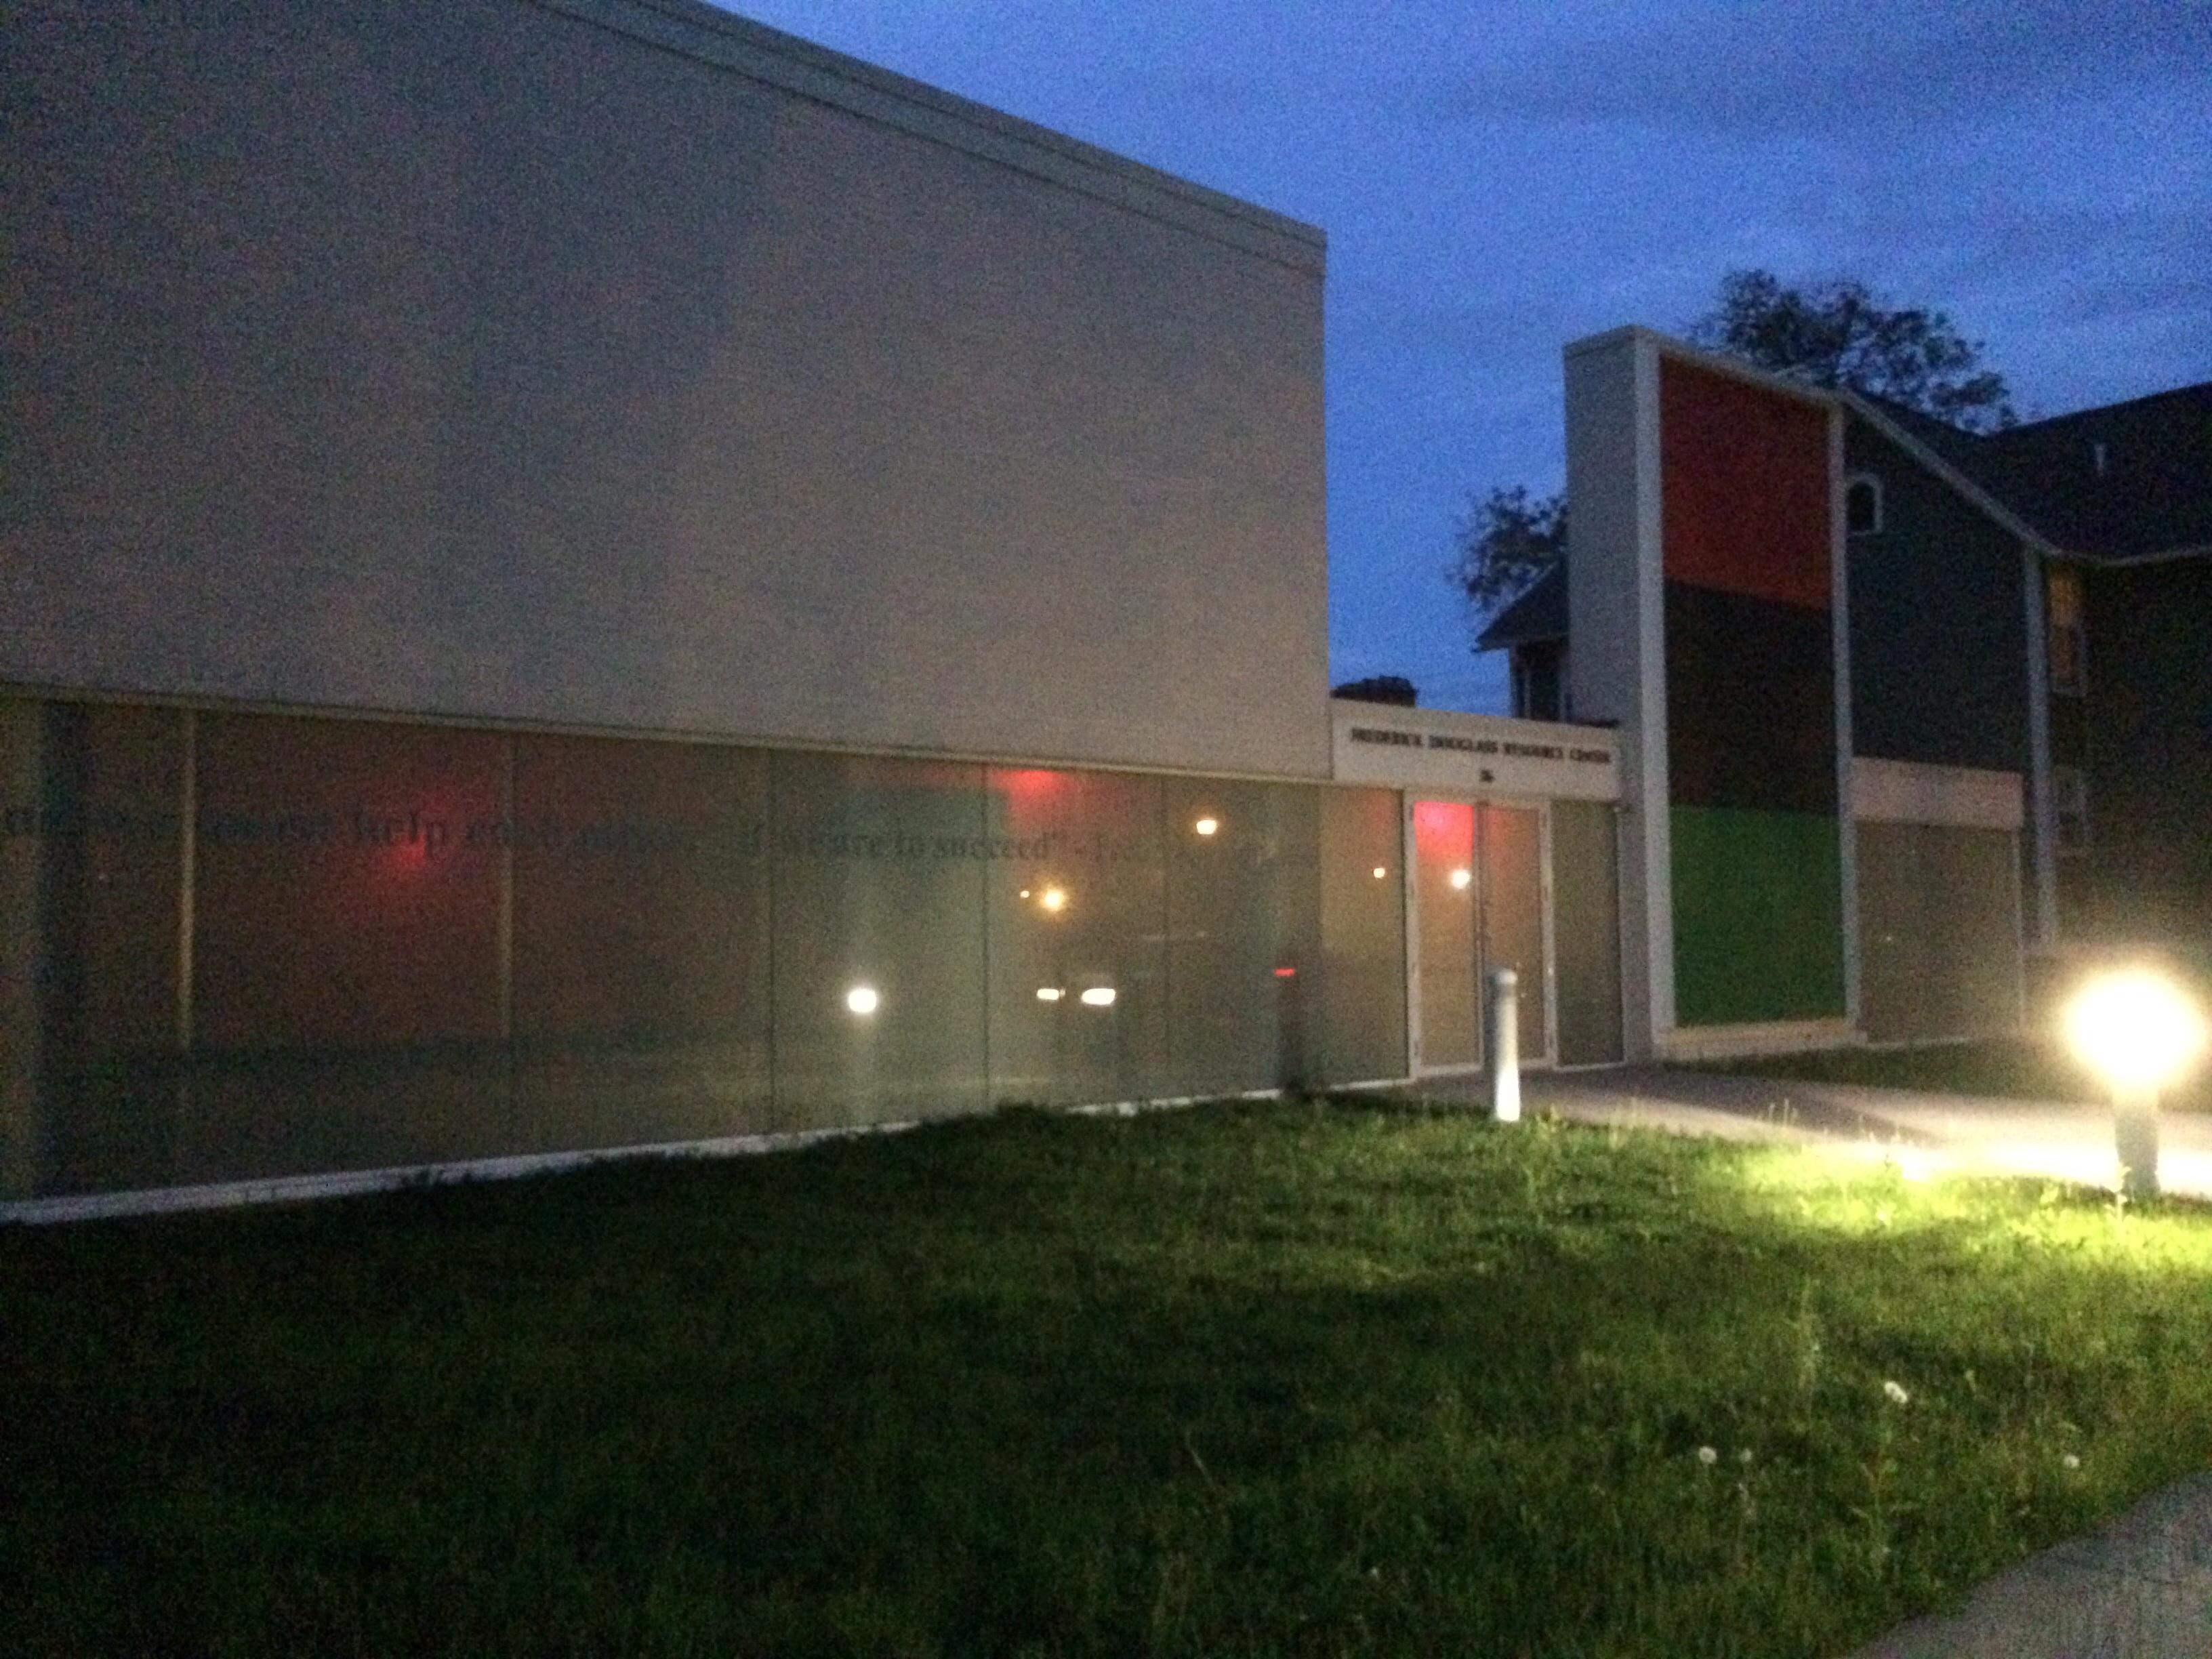 FD Resource Center -- evening time